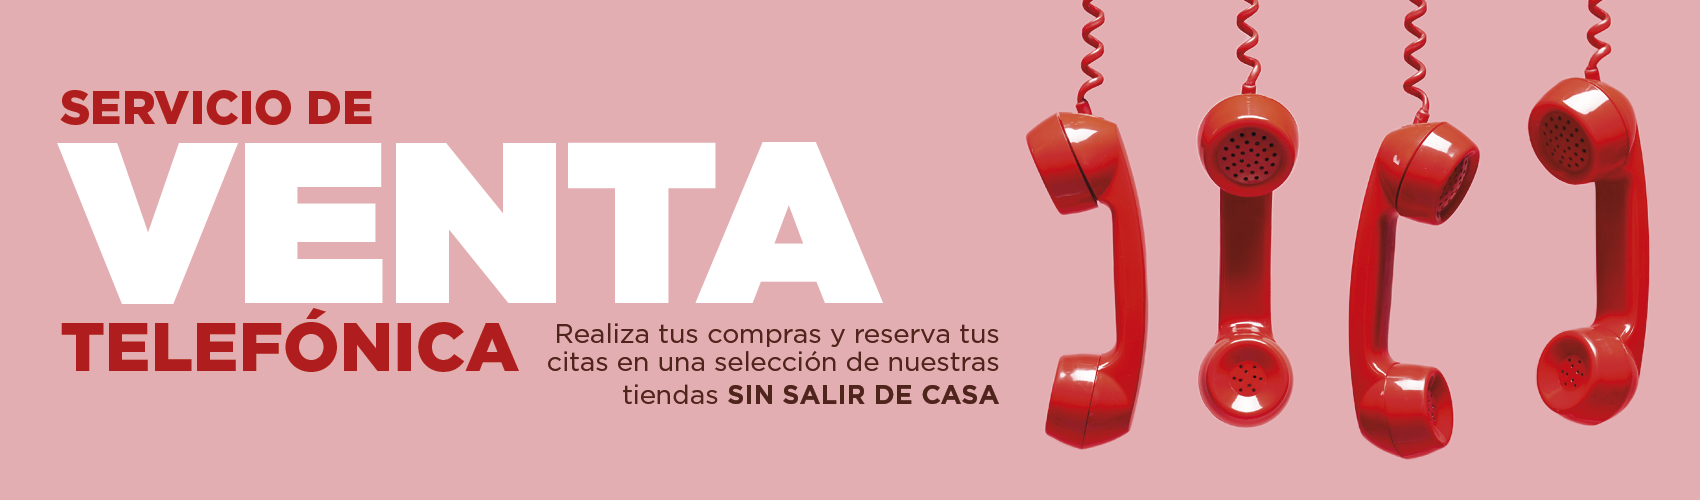 Gran sur_venta telefonica_cabecera web